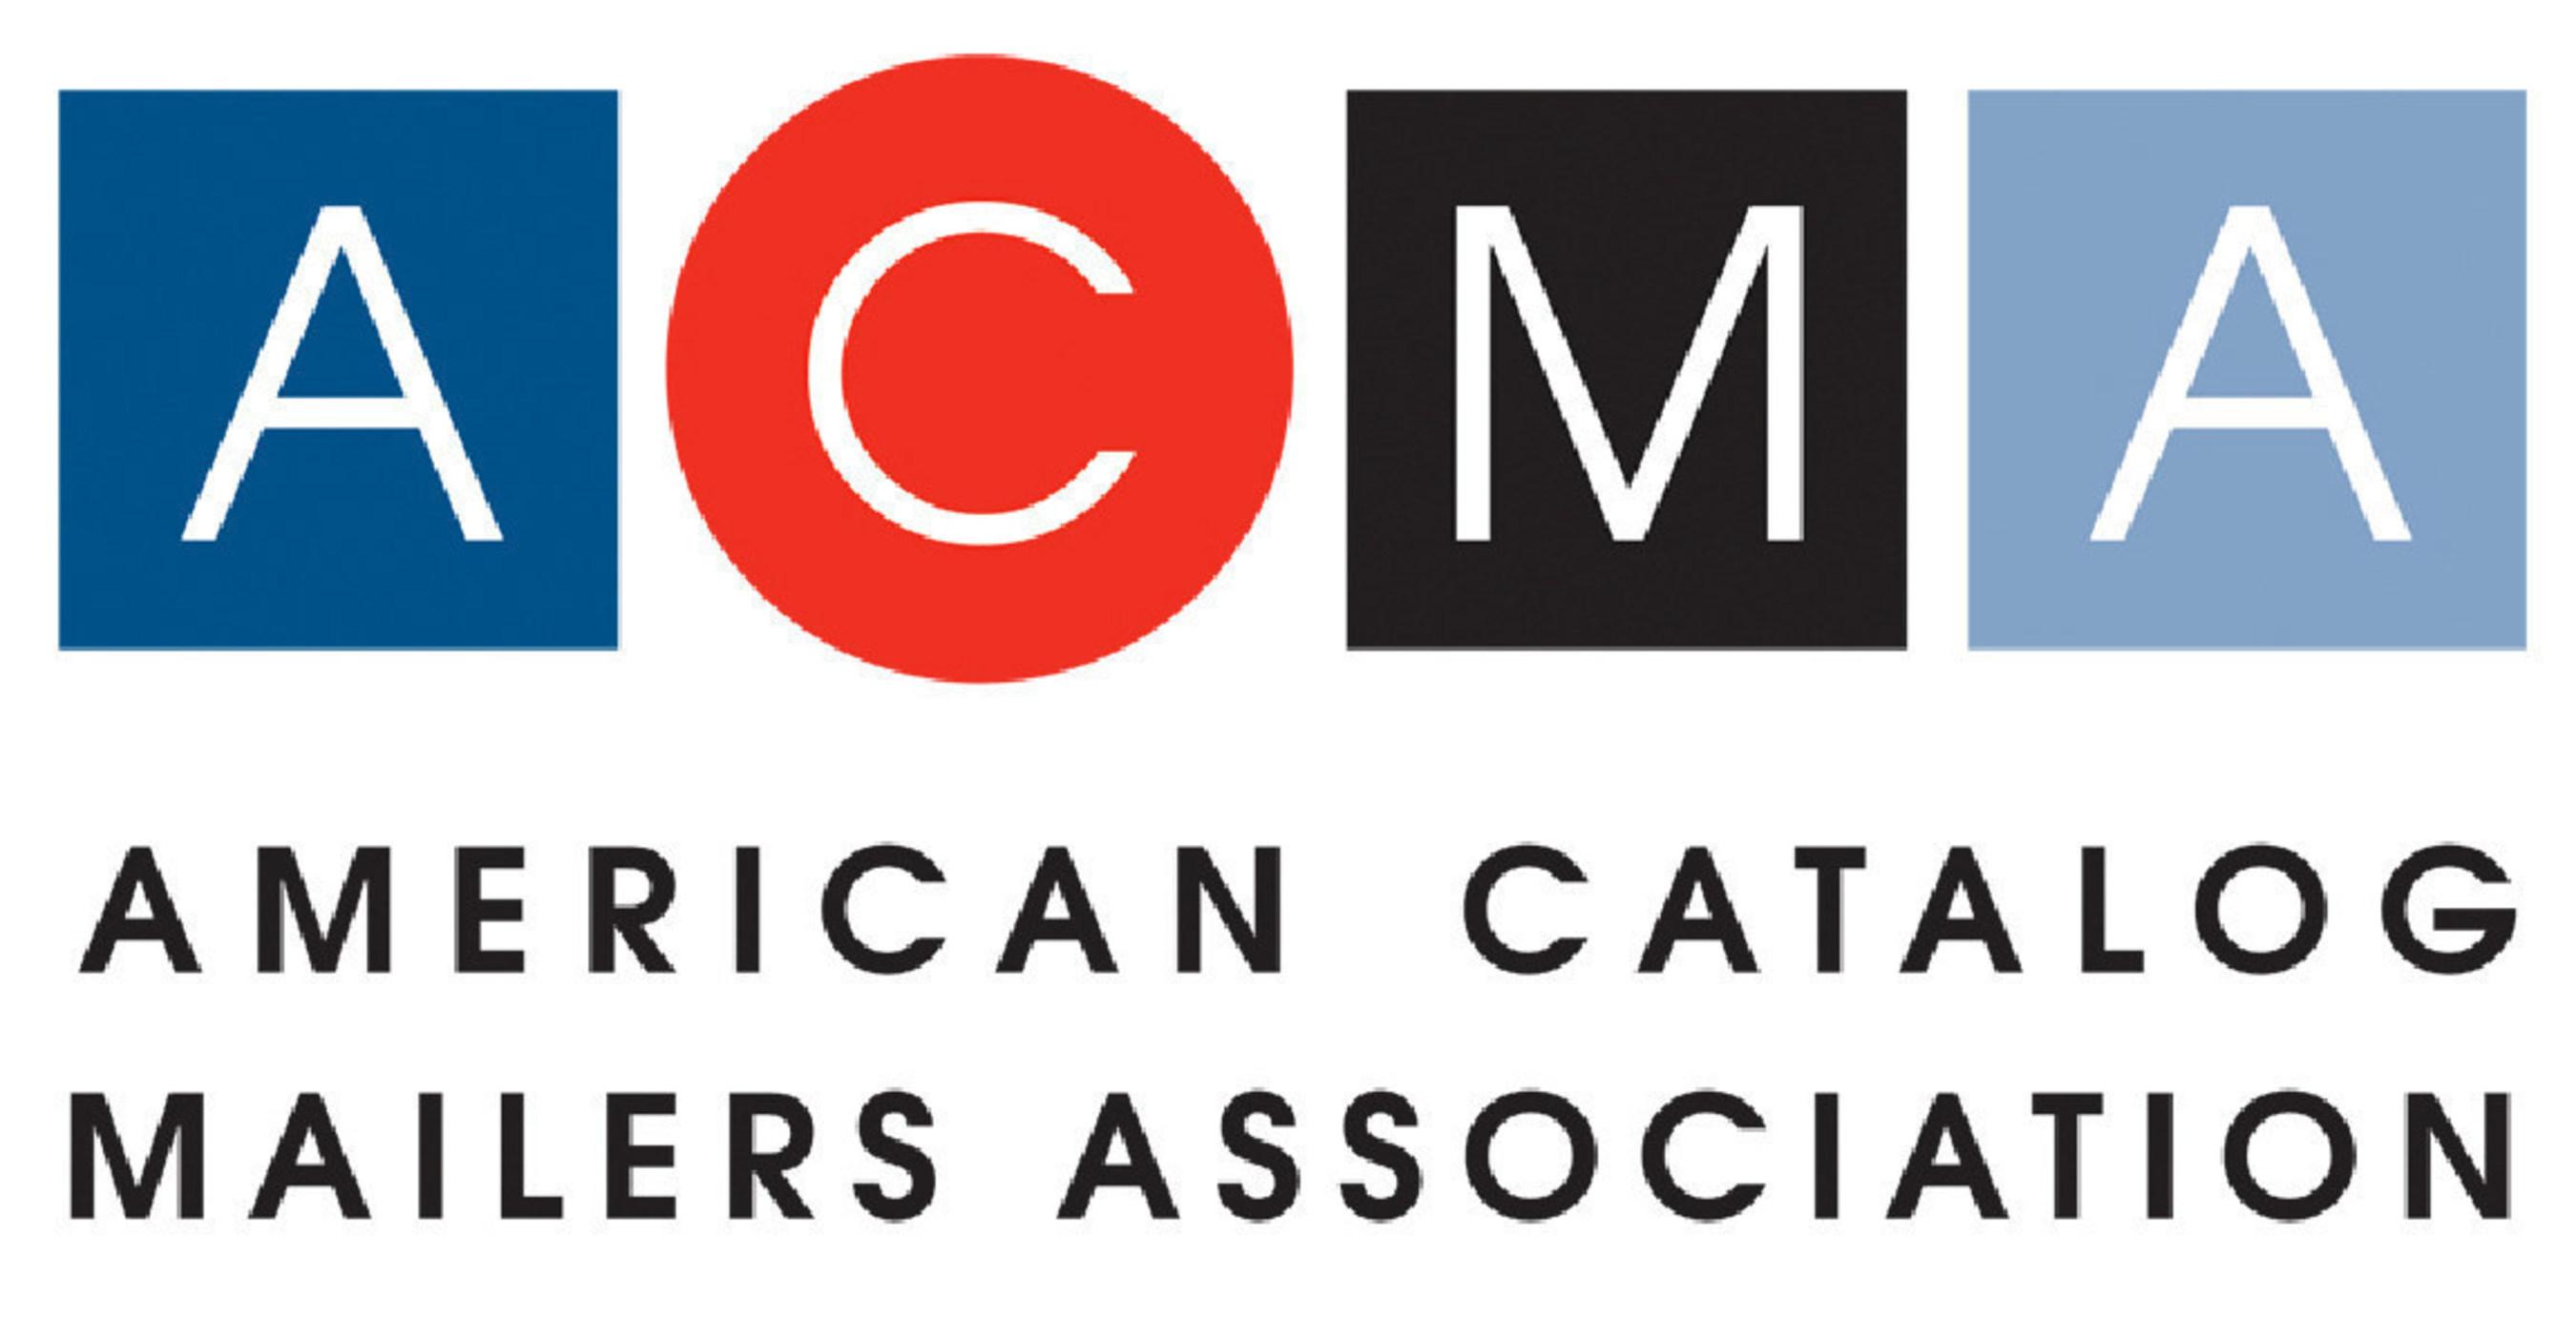 American Catalog Mailers Association (ACMA)